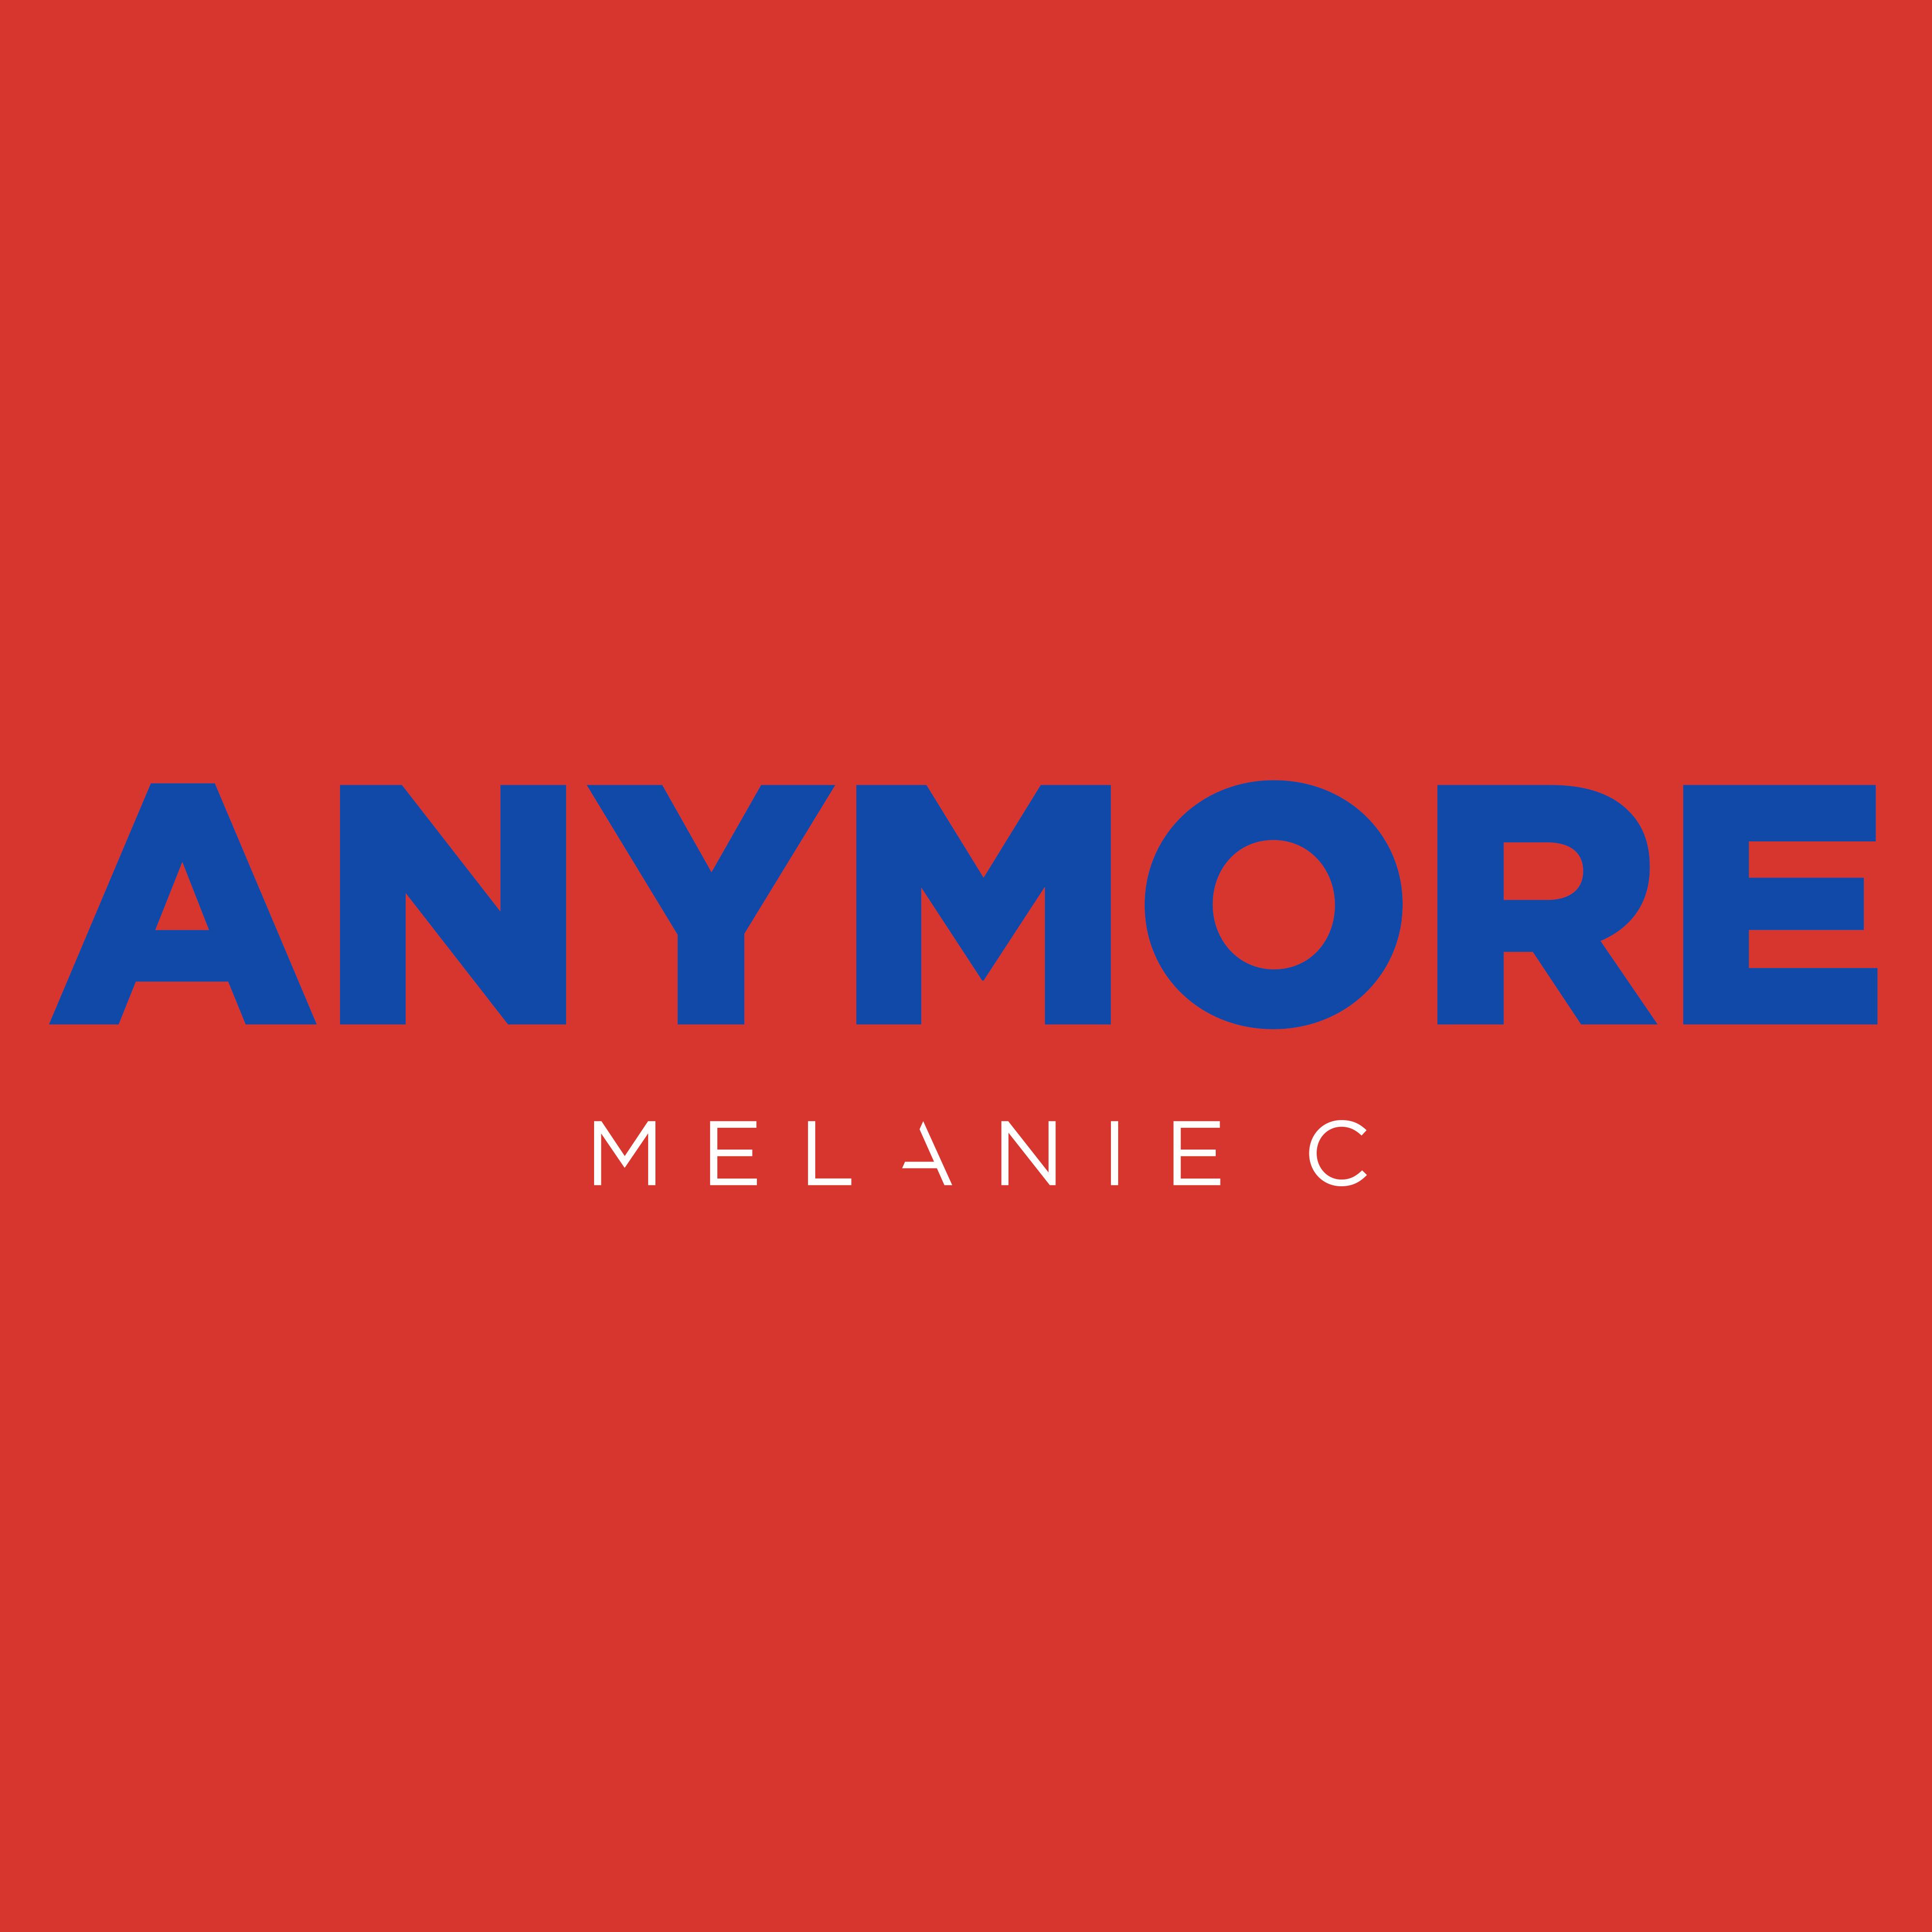 Anymore - (CD Single) - Melanie C